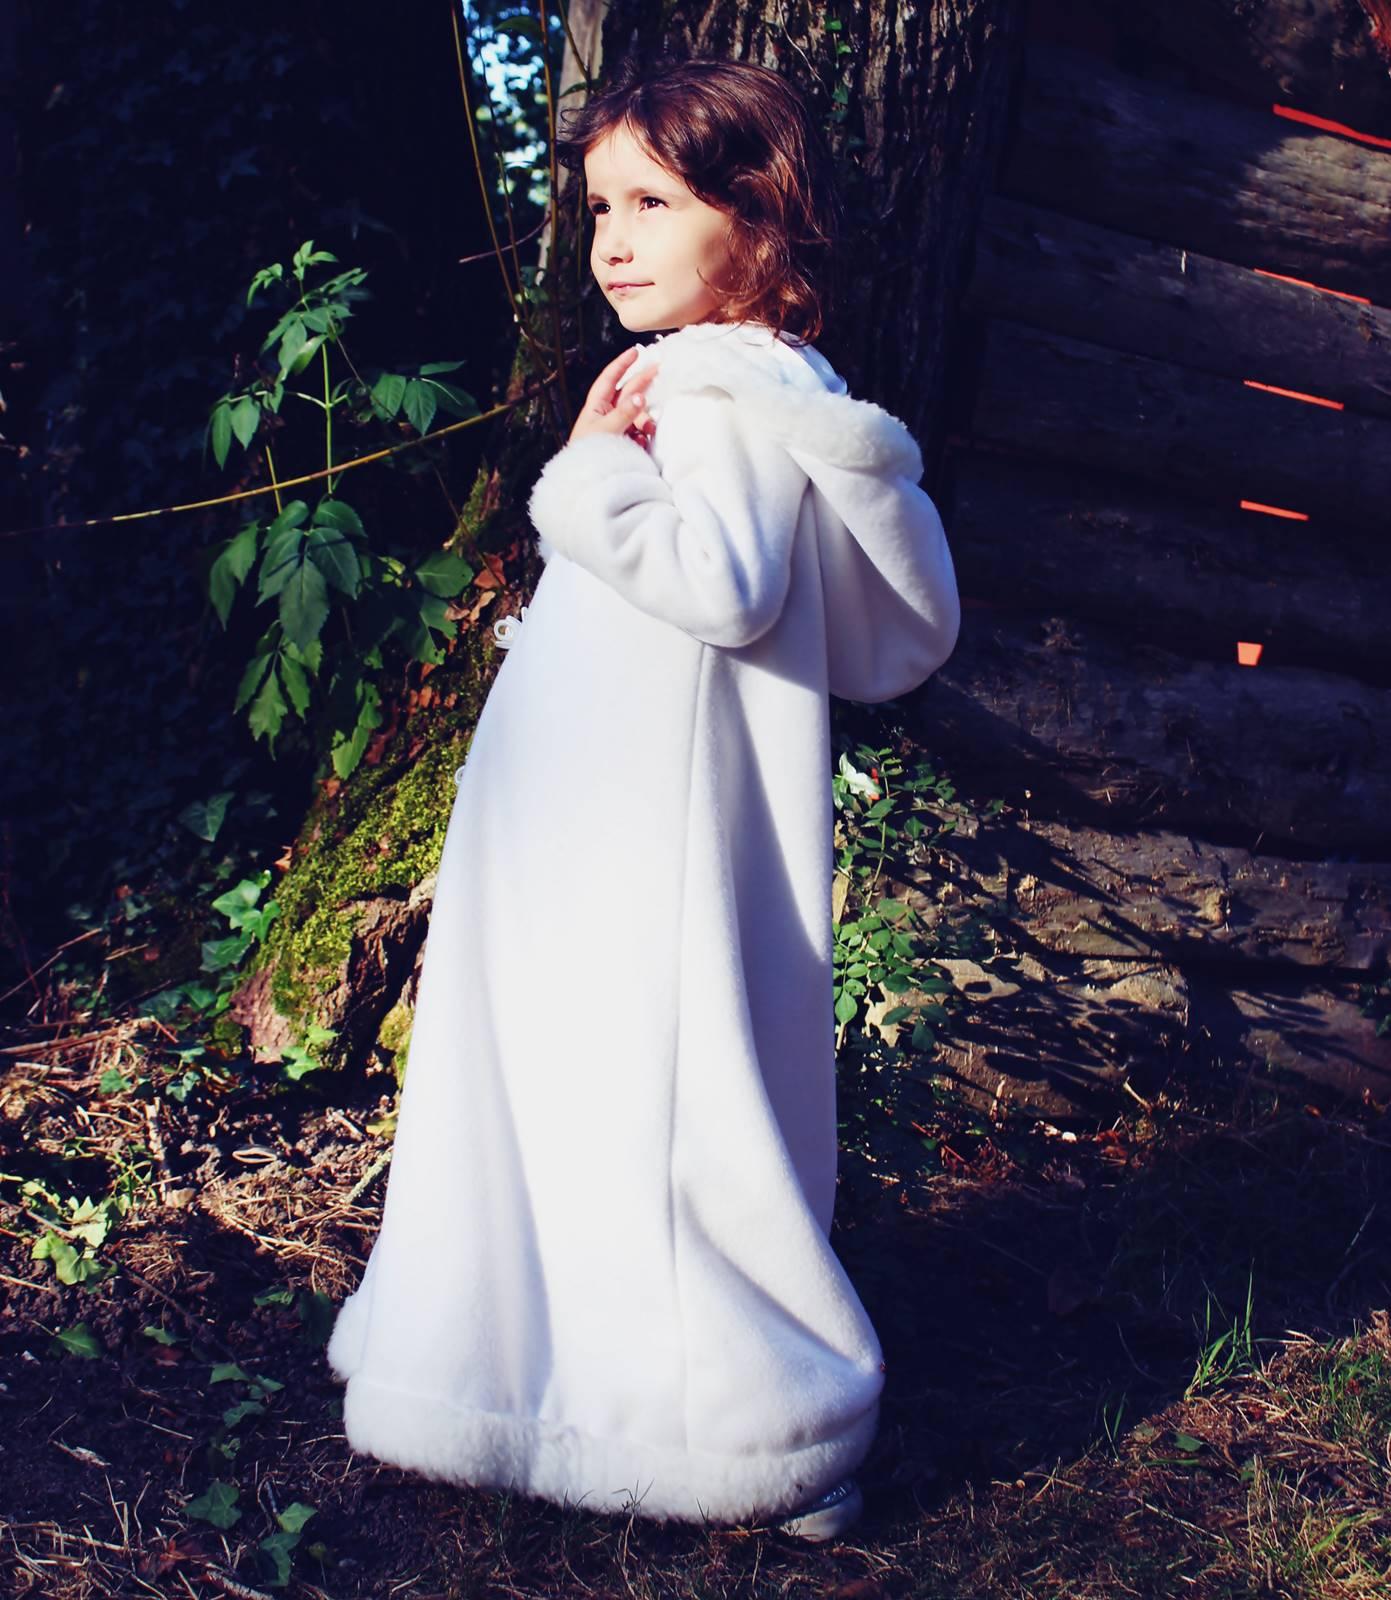 Manteau enfant made in france zero dechet 3